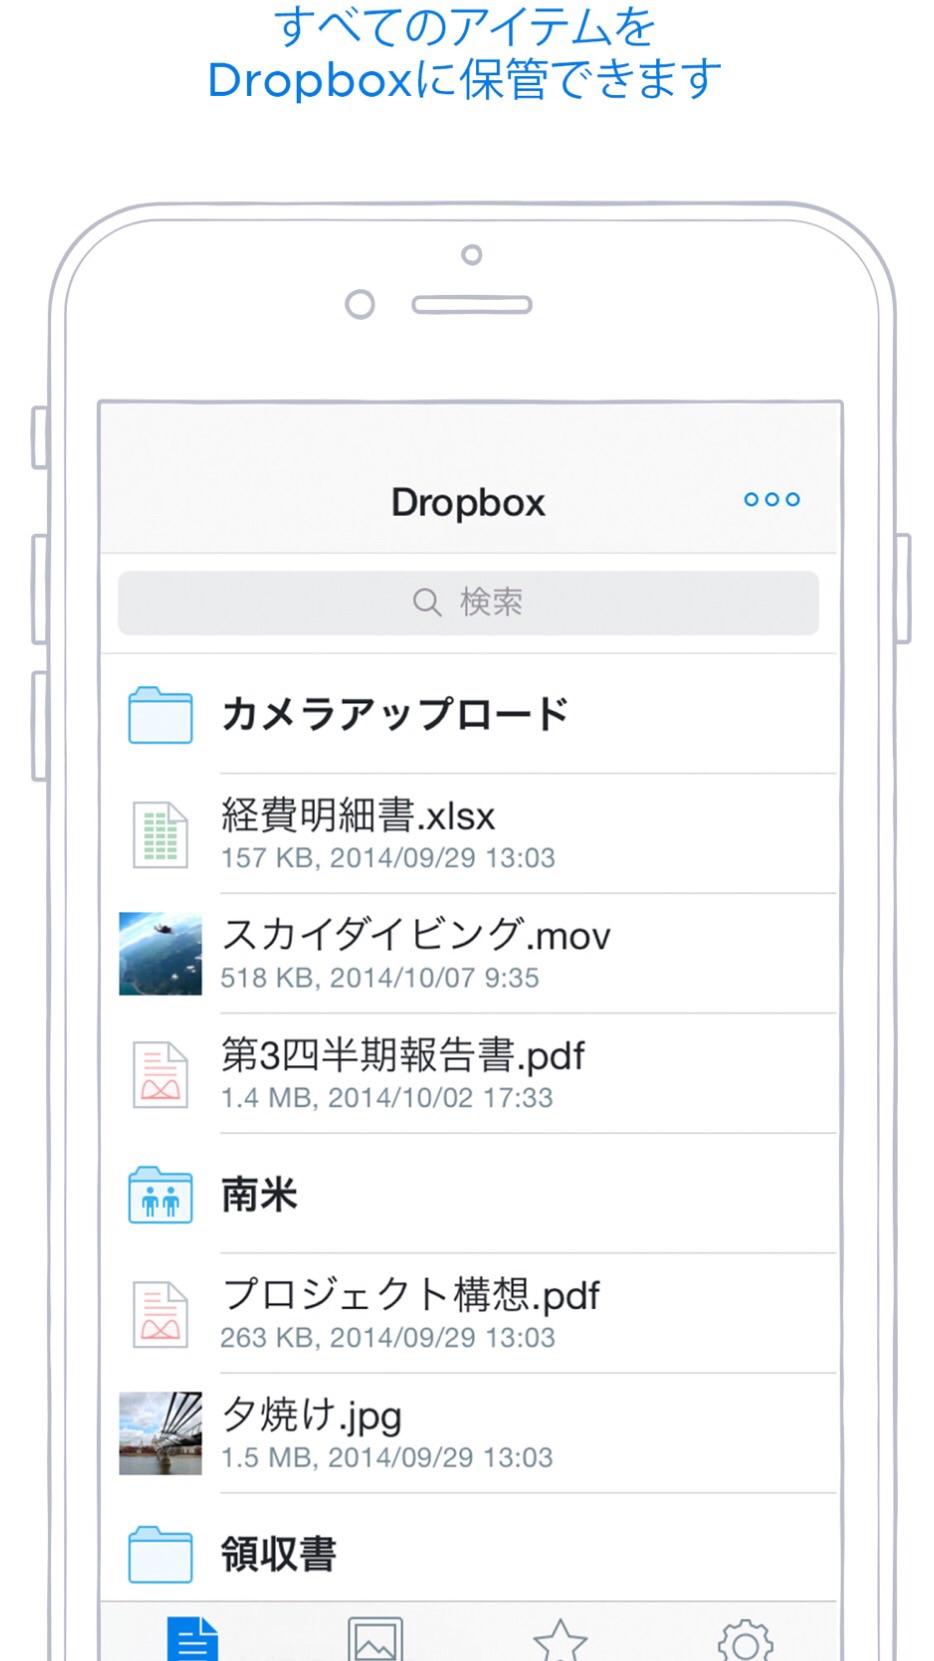 Dropbox-2